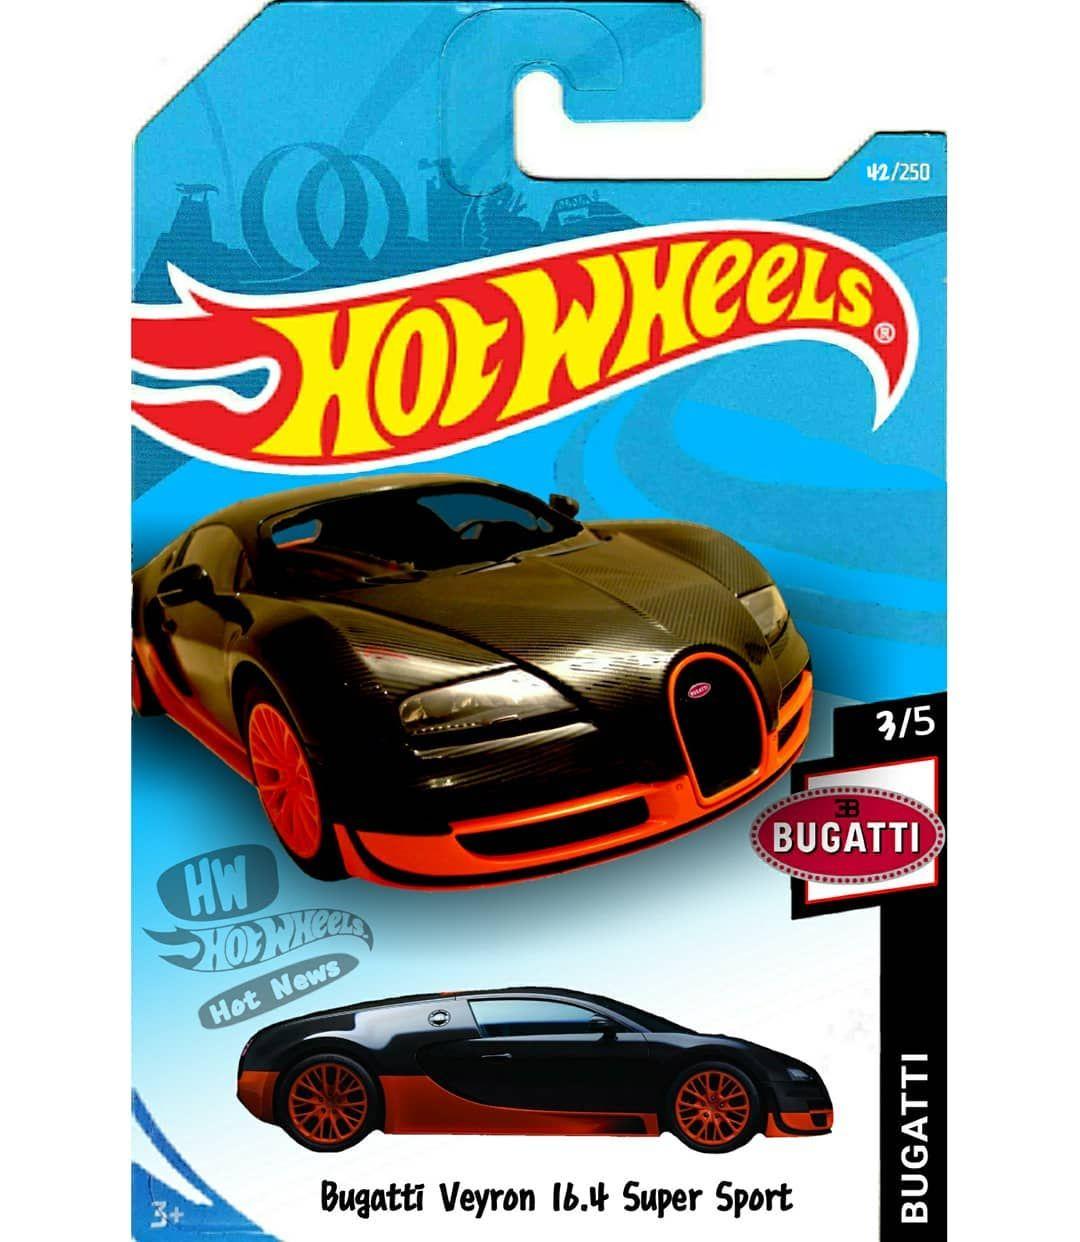 My Third Custom Bugatti Veyron 16 4 Super Sport You Want This In Real Hw Hotwheels Hotwheelscollect Bugatti Veyron 16 Bugatti Veyron Veyron